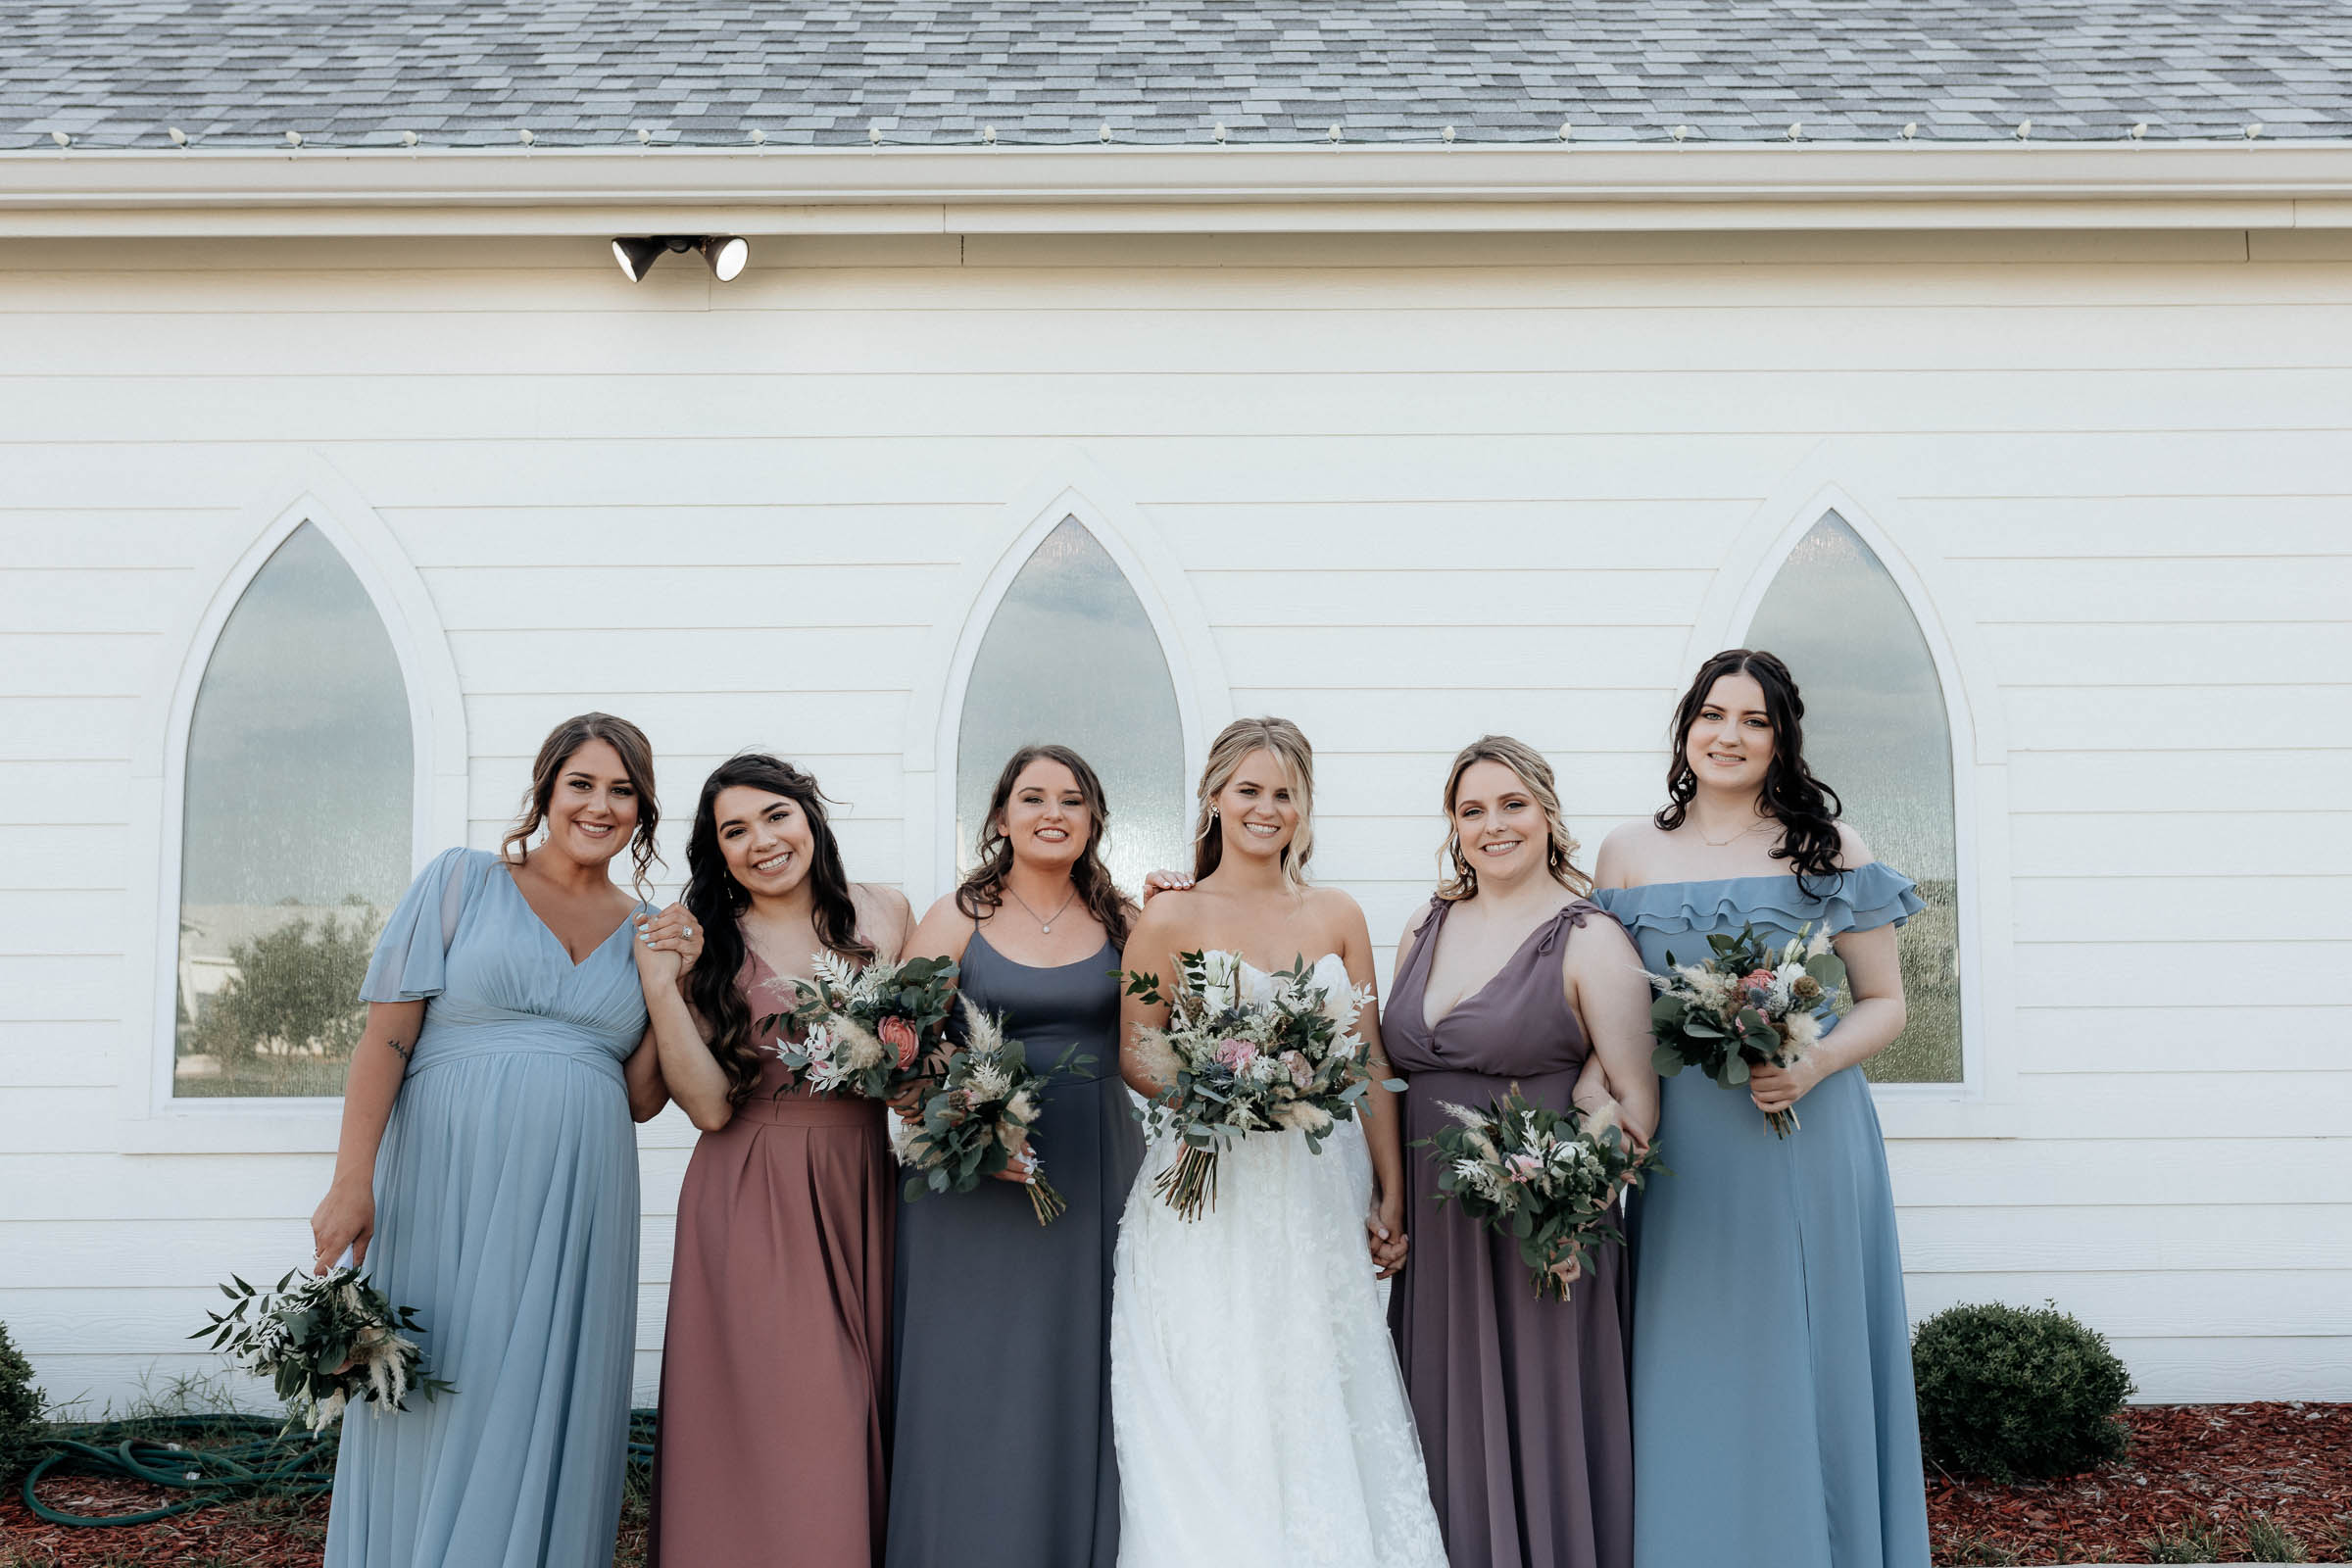 bridesmaids portraits in summer wedding in texas